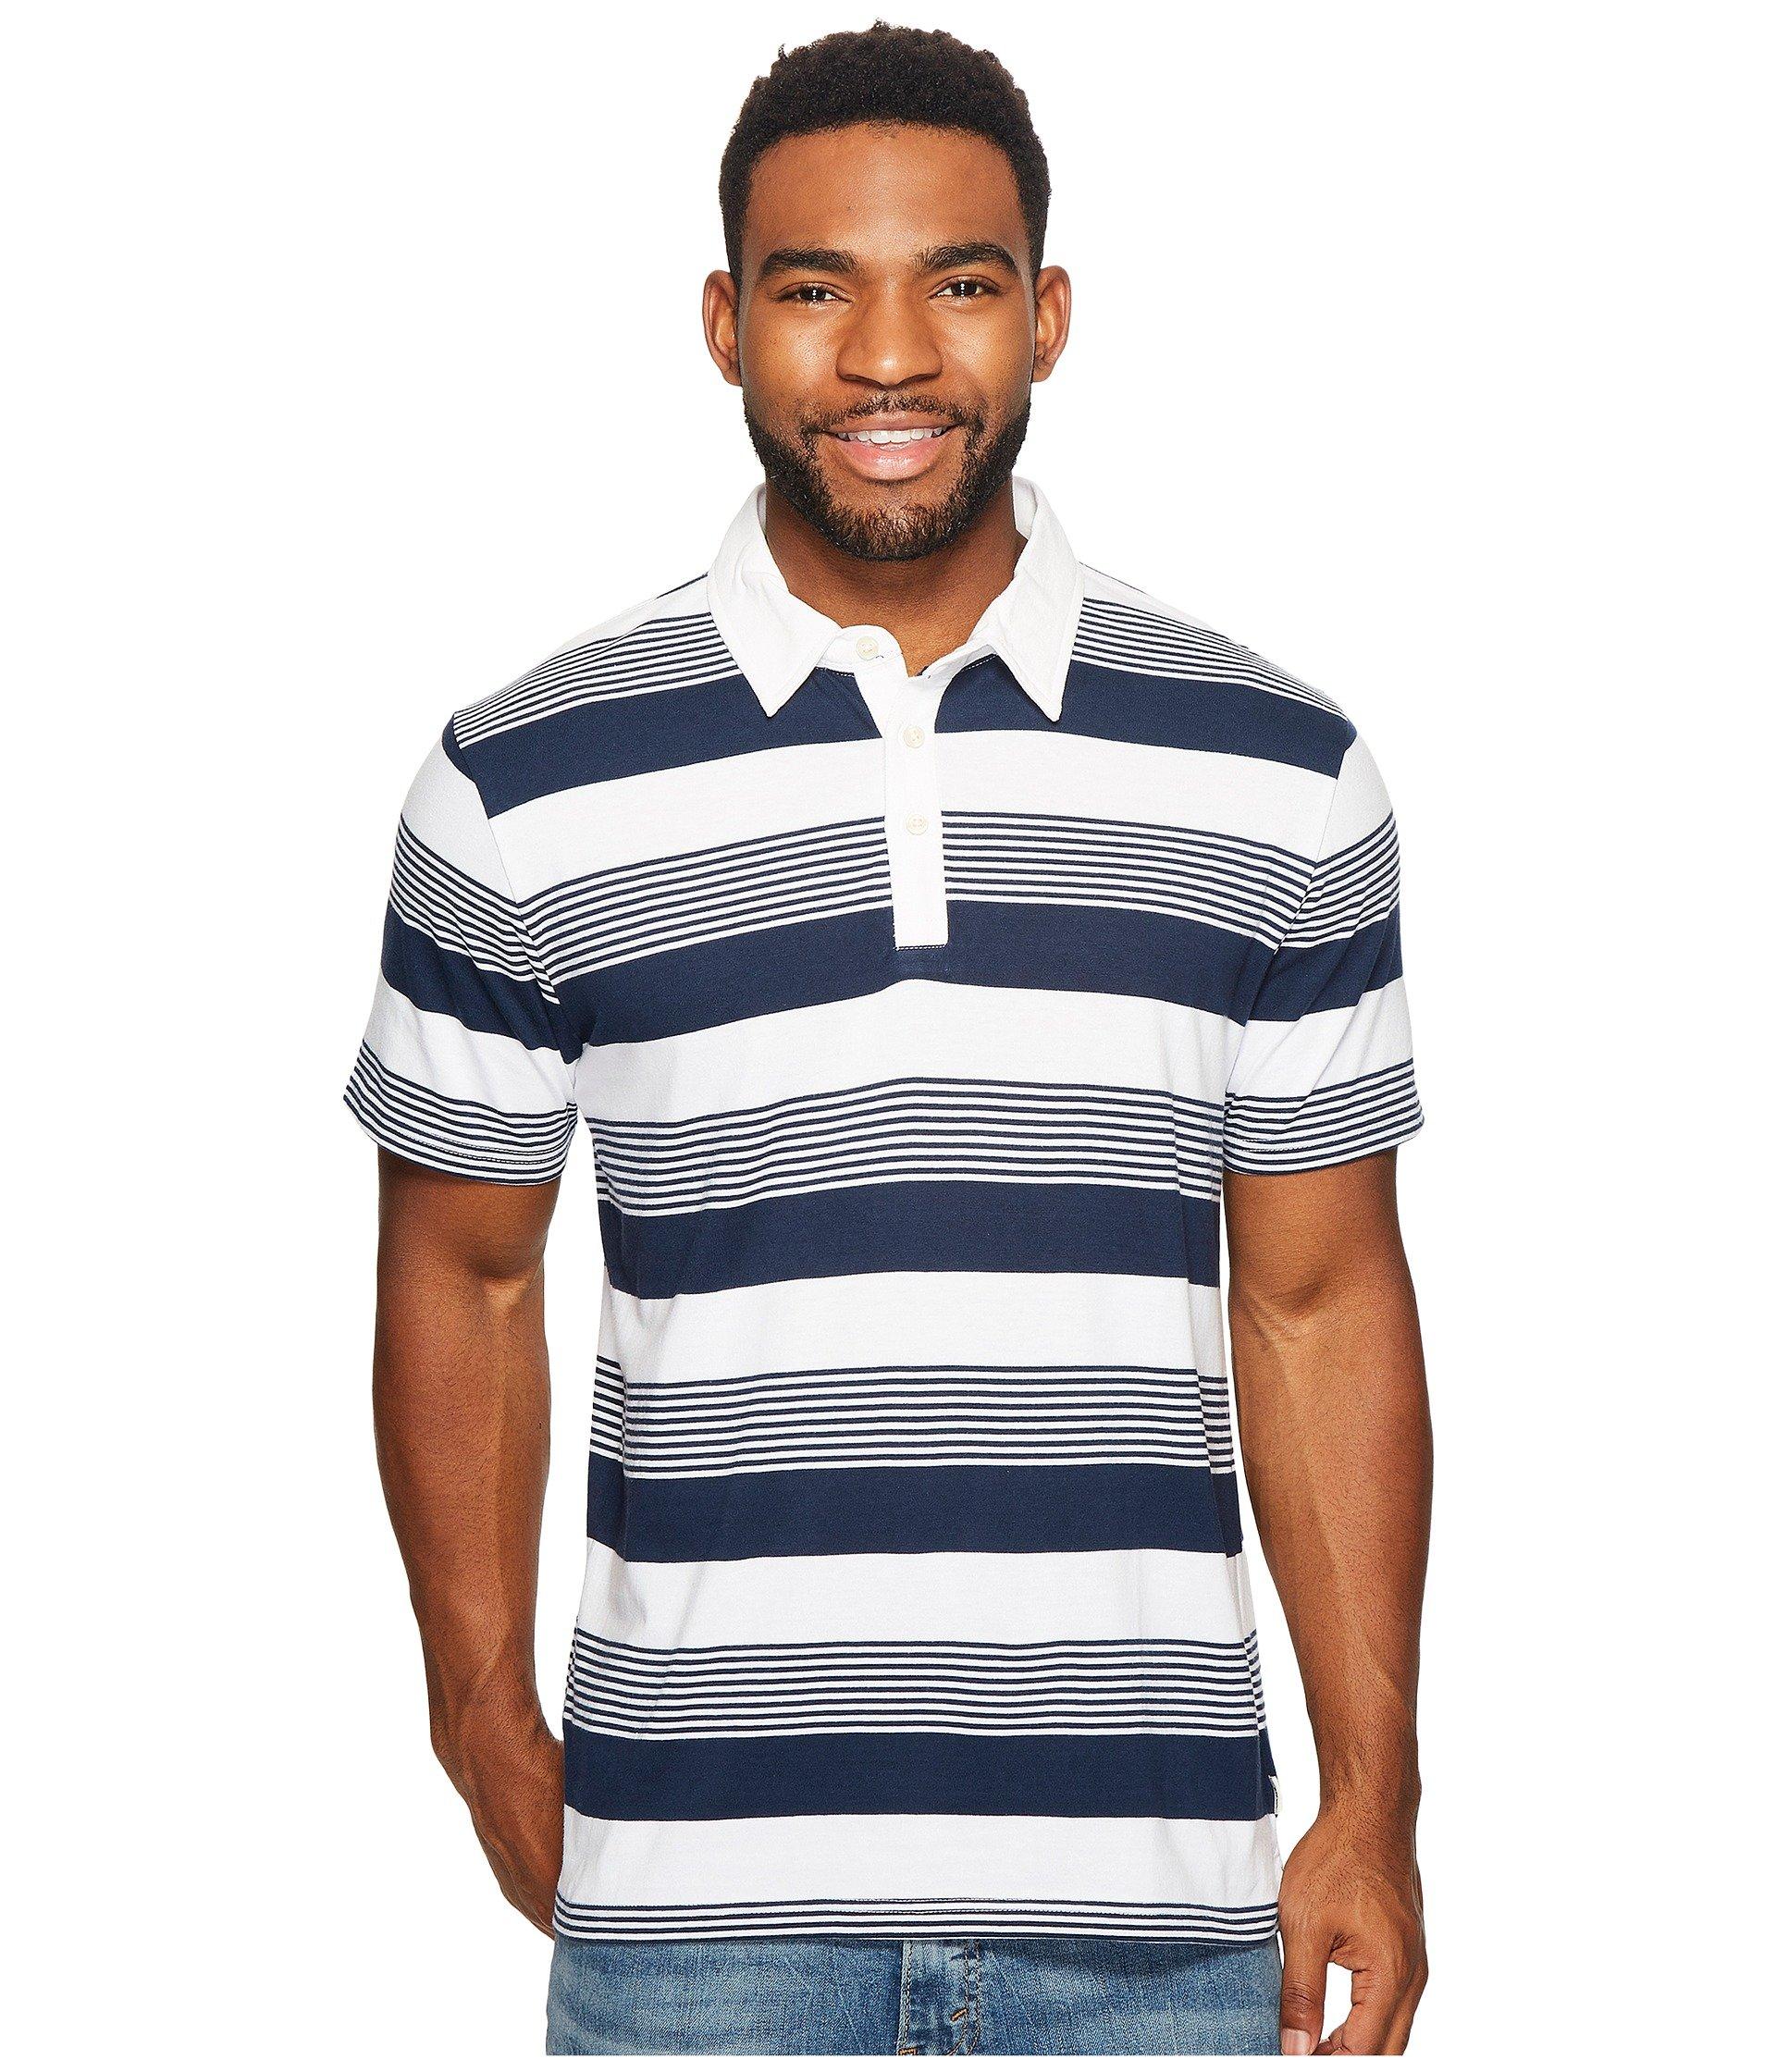 Camiseta Tipo Polo para Hombre Vans Chima II Short Sleeve Polo  + Vans en VeoyCompro.net